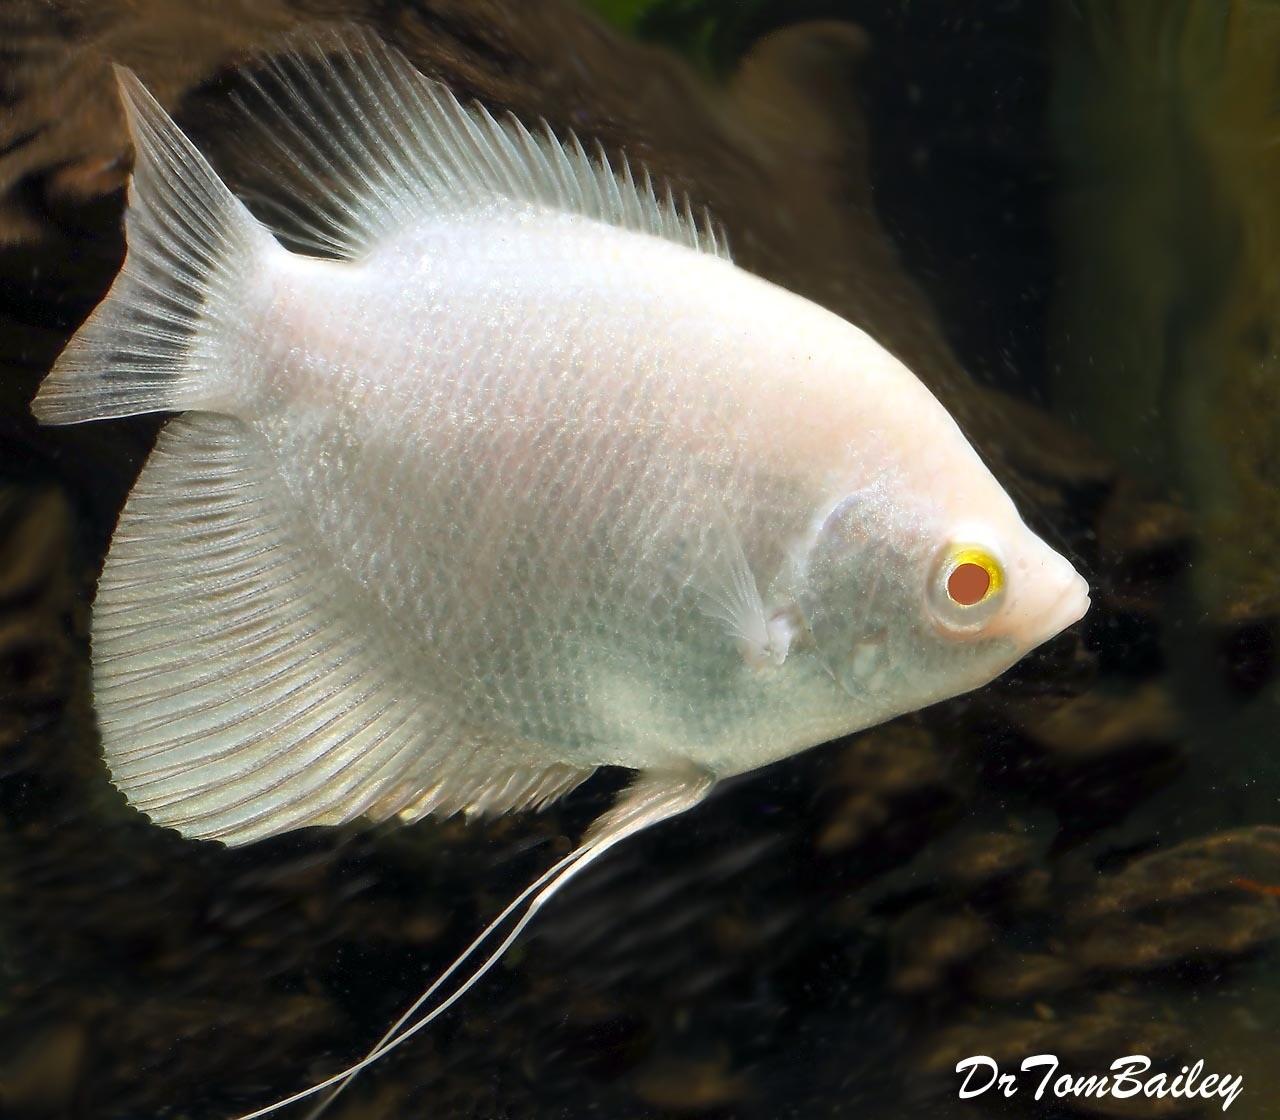 Premium Rare New, WYSIWYG, Albino Giant Osphronemus Goramy